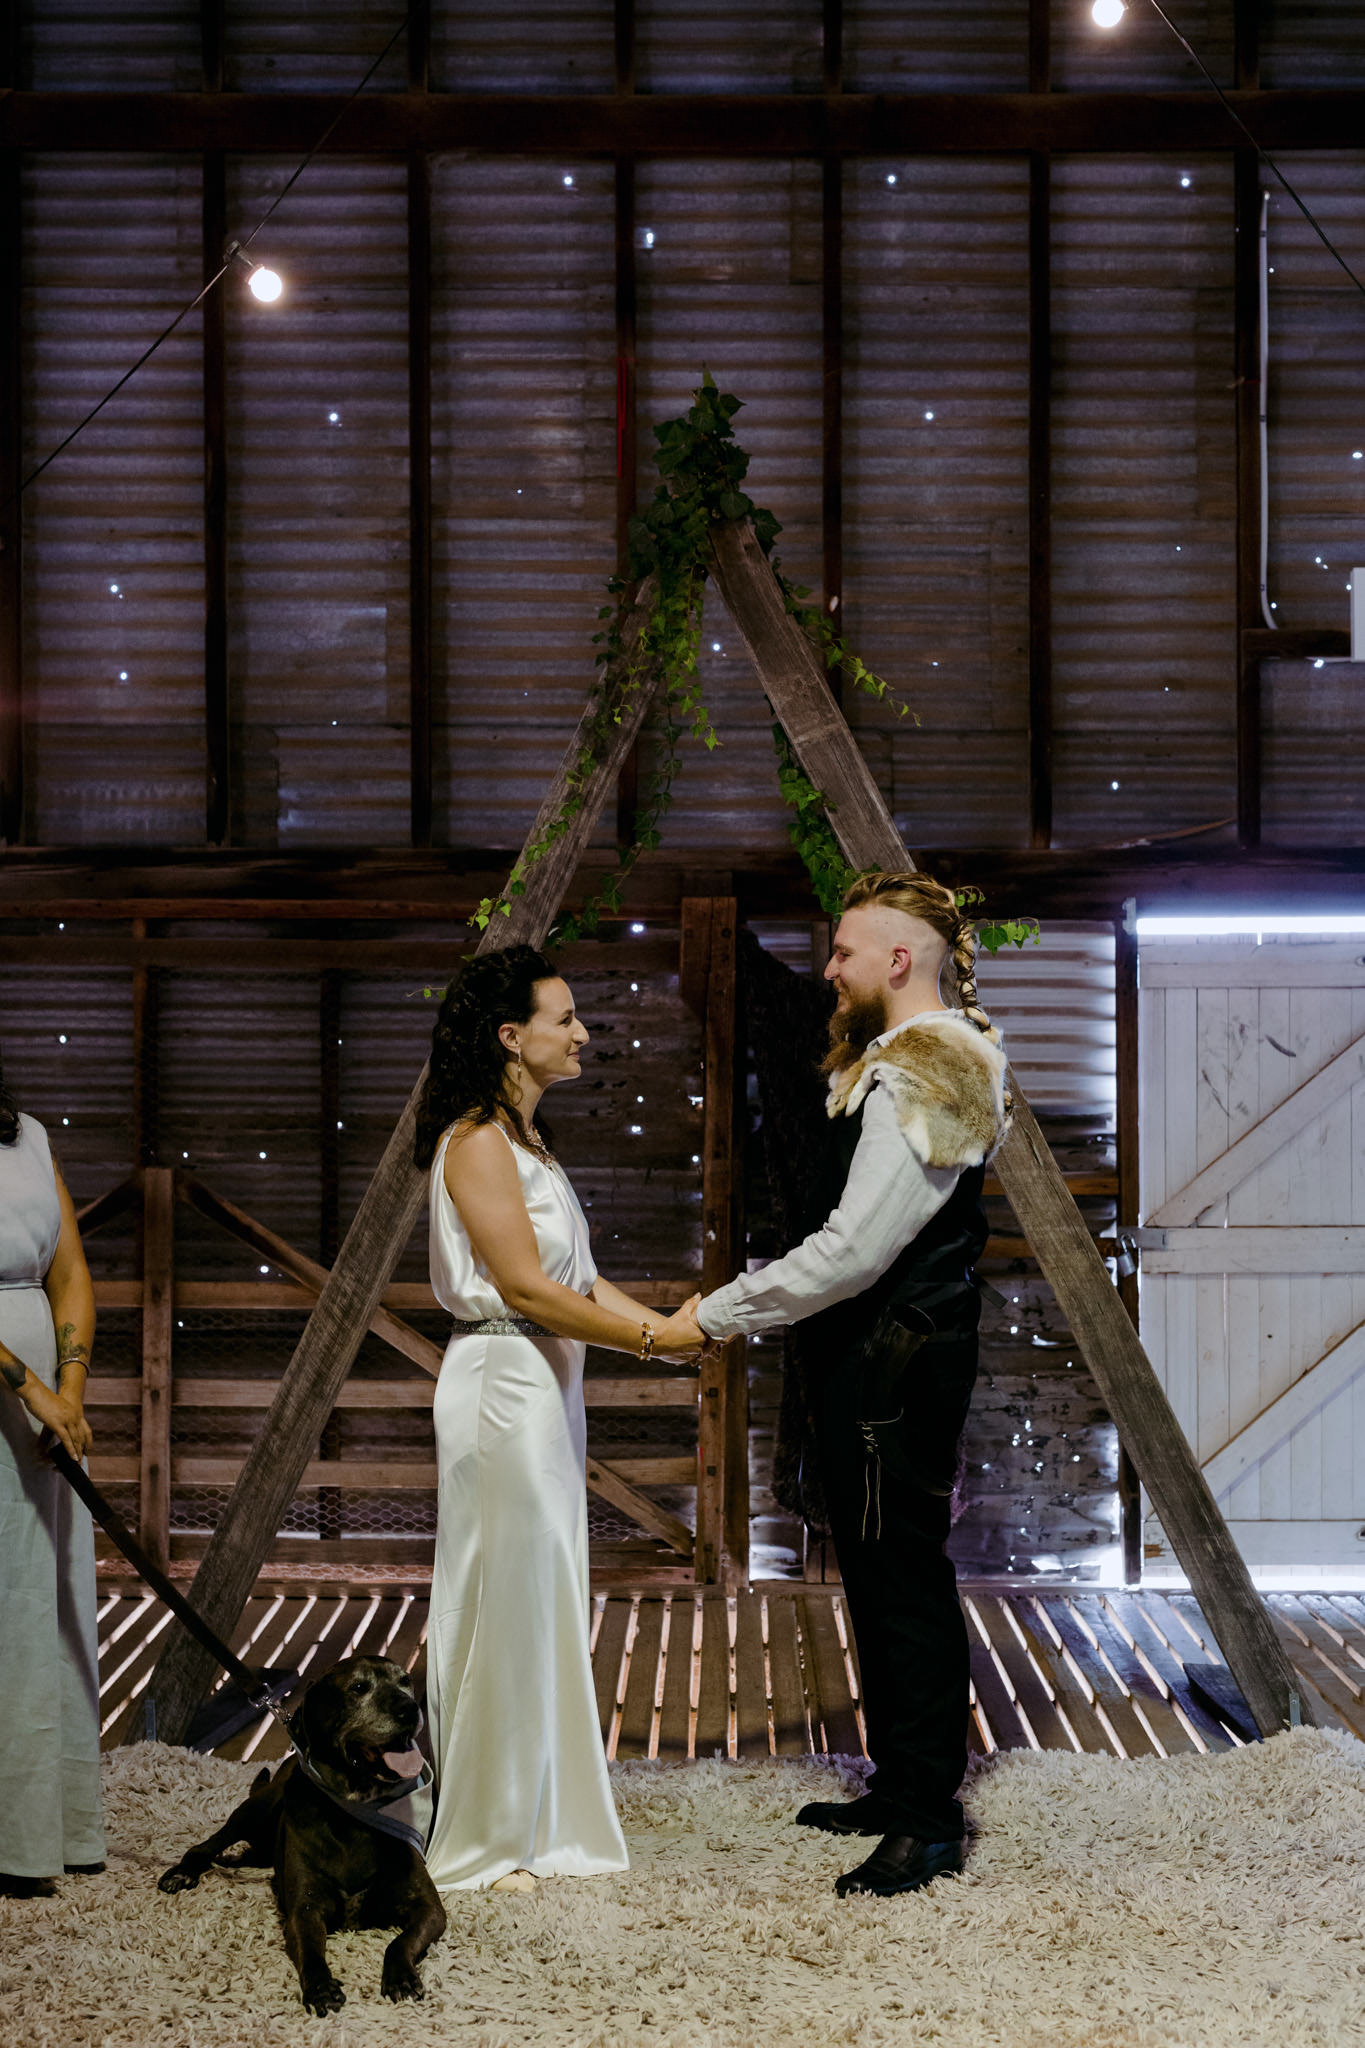 Yarralumla Woolshed Canberra Wedding Photographer Erin Latimore_119.JPG